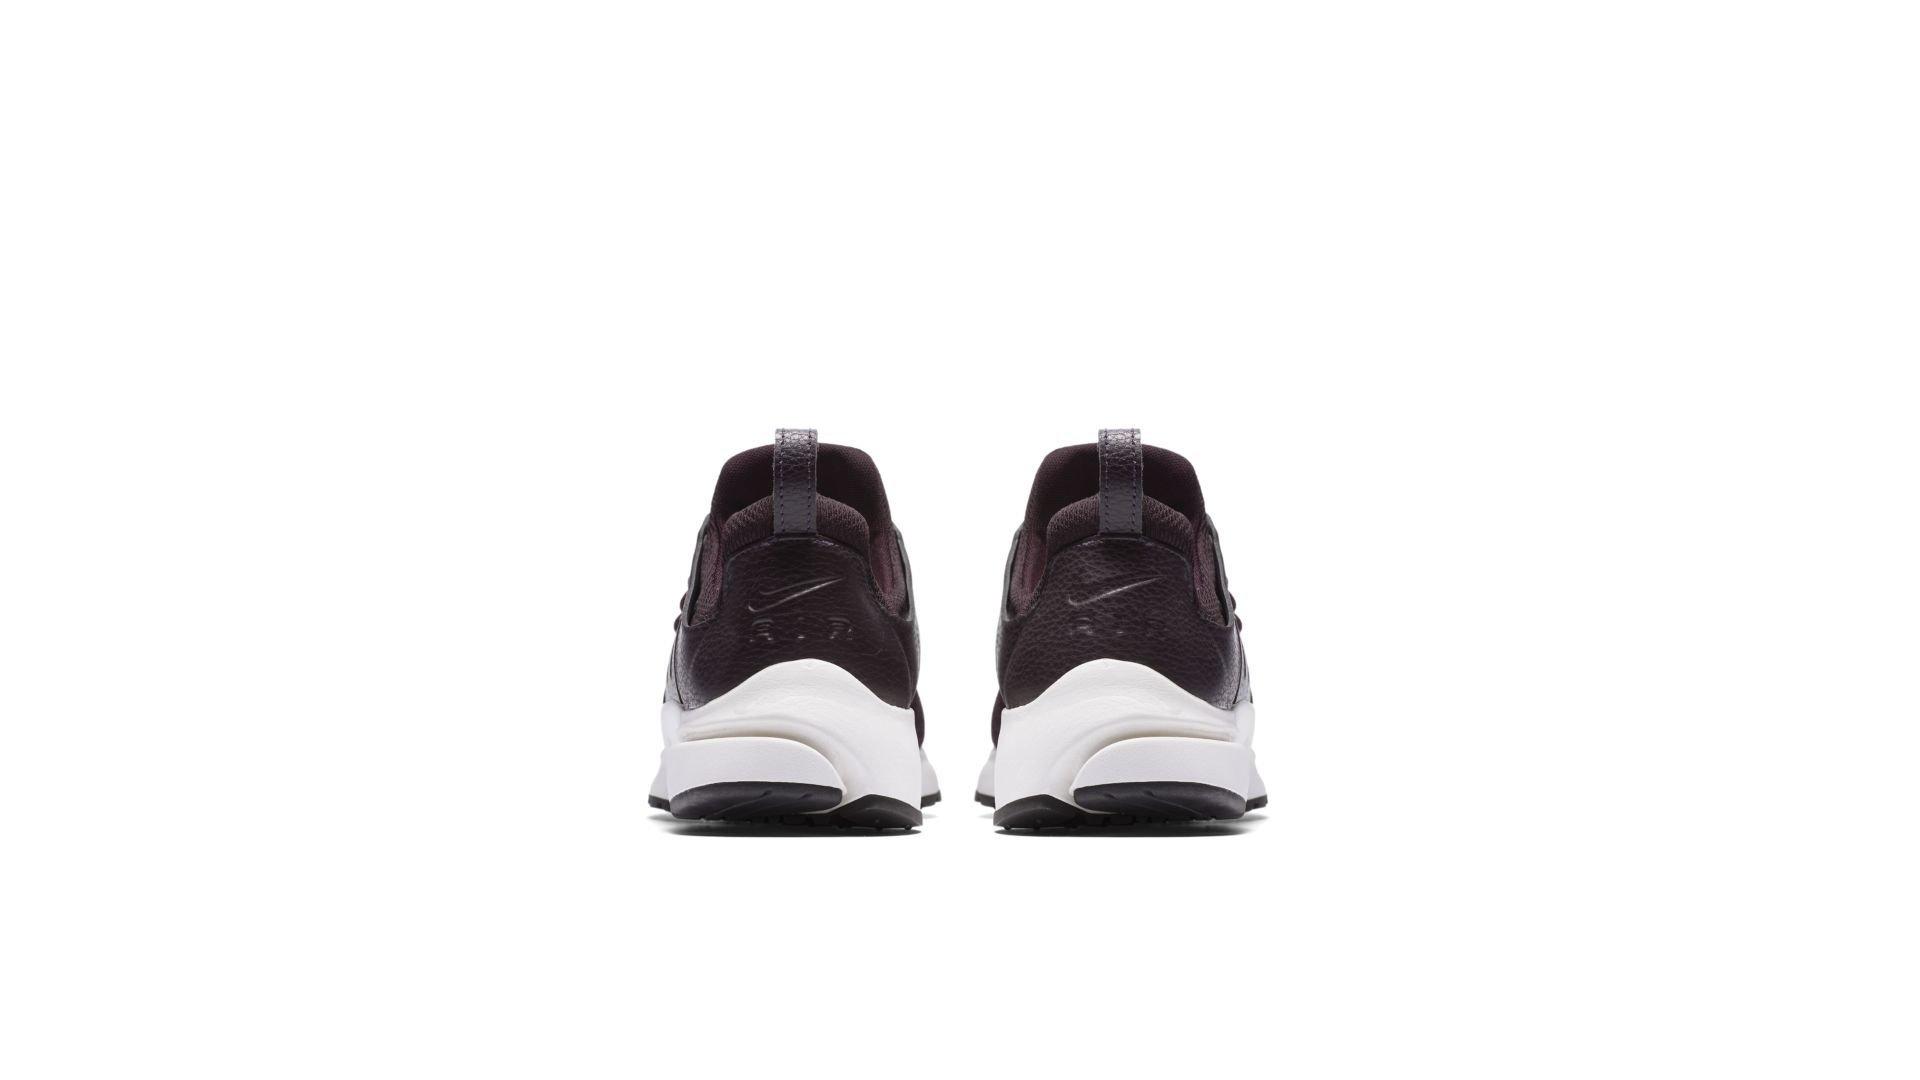 Nike Air Presto Premium Burgundy Ash (848141-600)